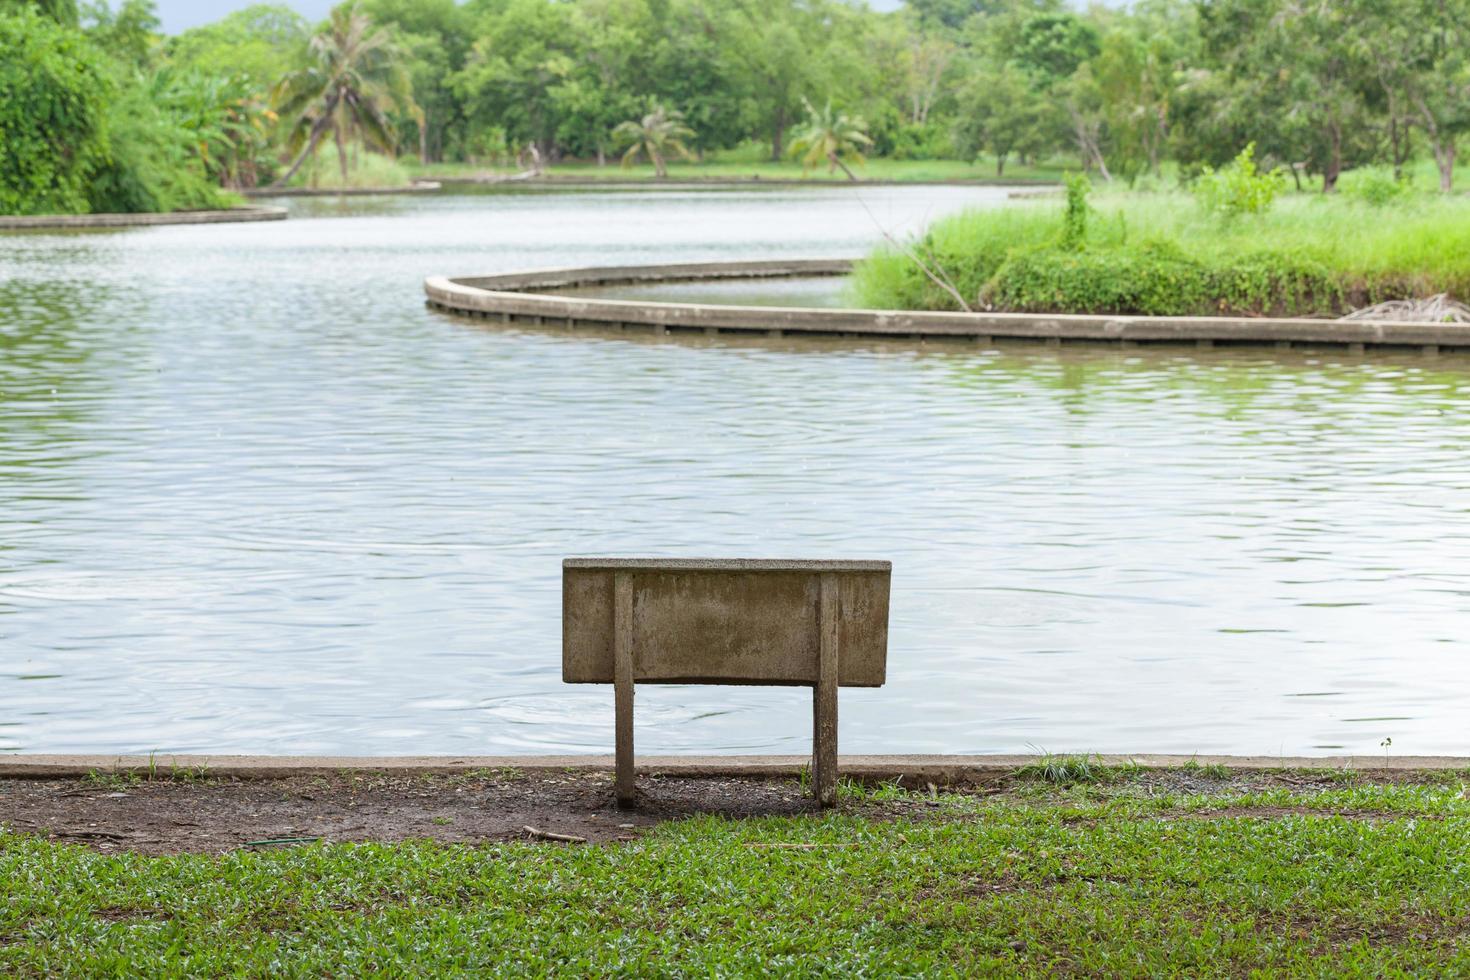 stenbänk i parken foto